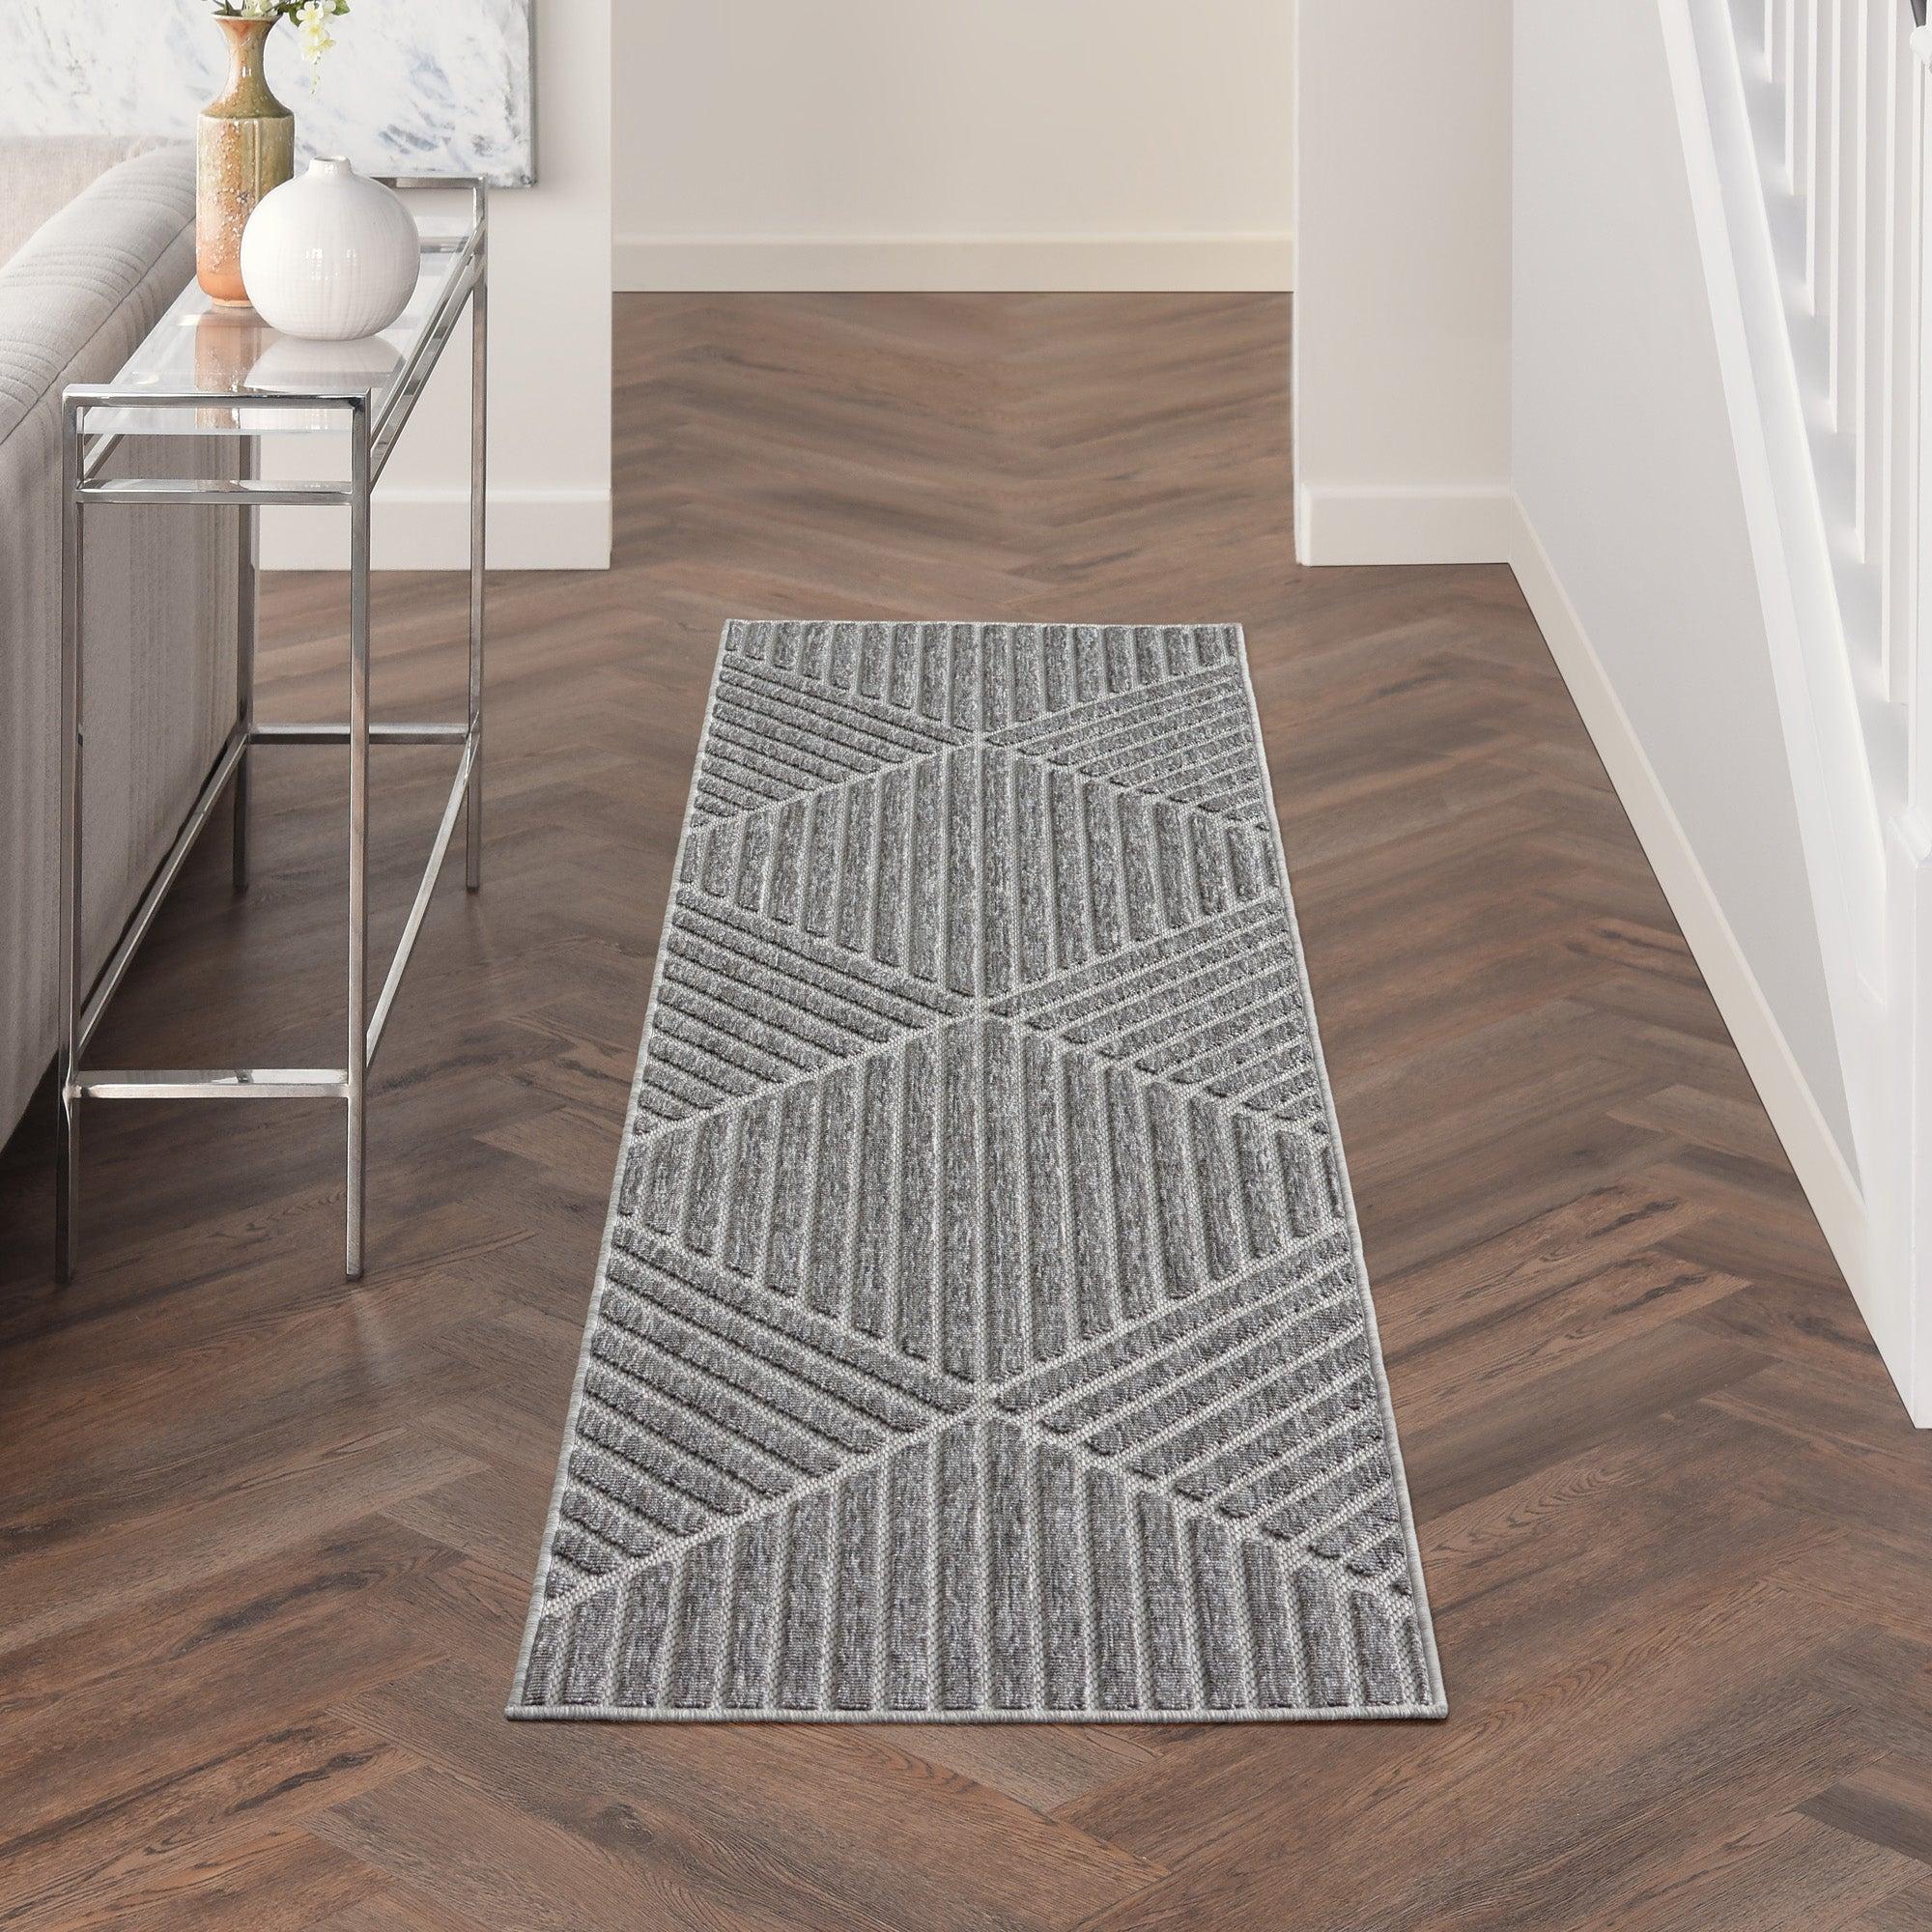 Photo of Cozumel stripe indoor outdoor runner cozumel stripe charcoal